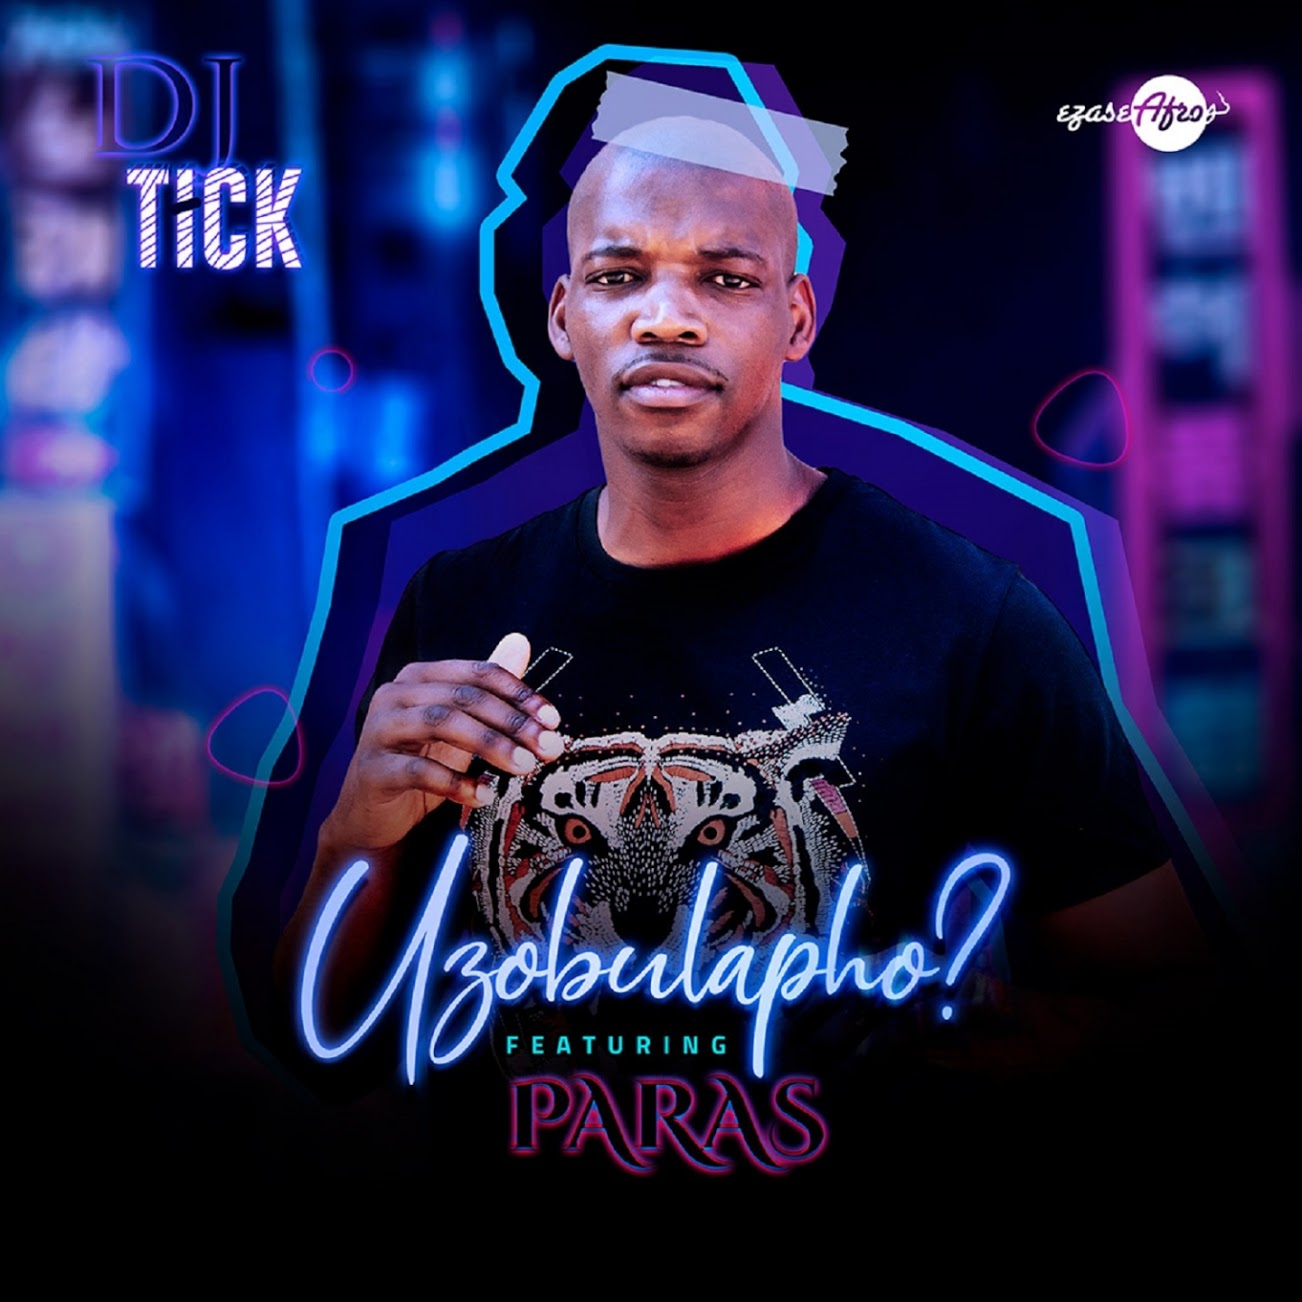 DJ Tick Uzobulapho - DJ Tick Ft. Paras – Uzobulapho